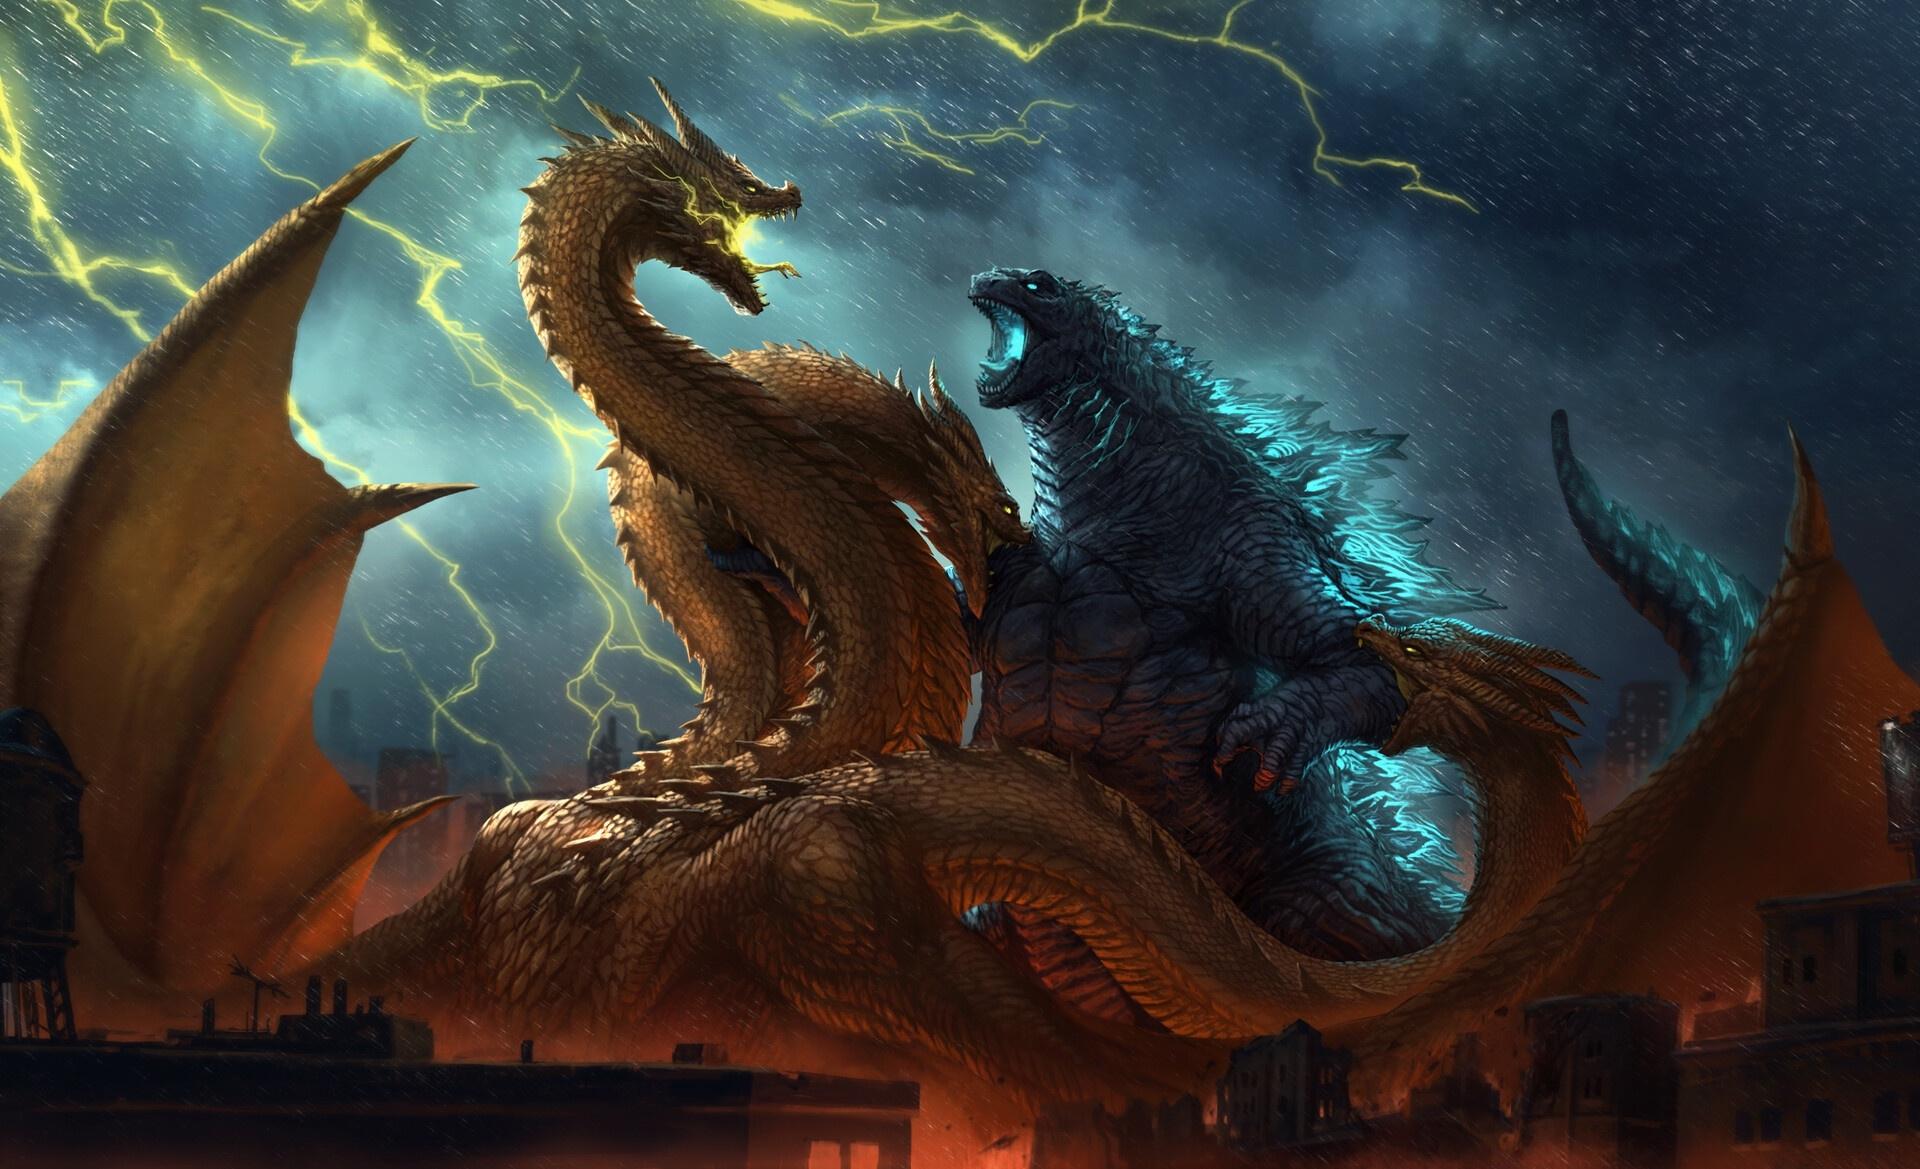 Godzilla Vs King Ghidorah King Of The Monsters Wallpaper Hd